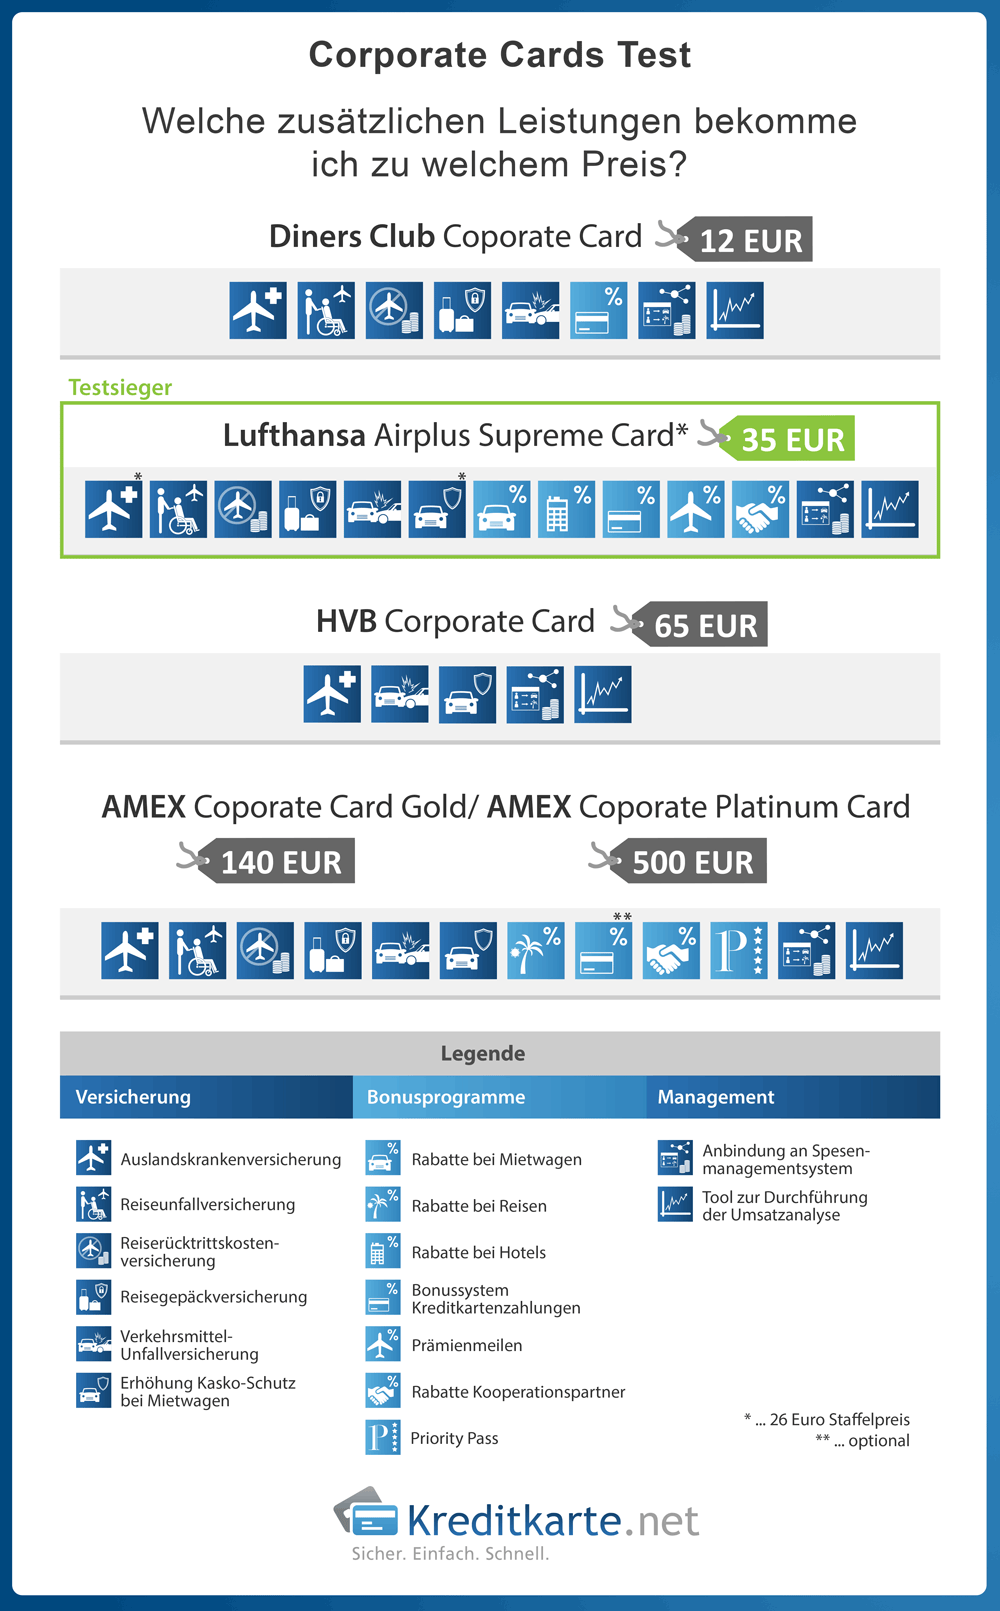 infografik-corporate-card-test-gruende-kosten-corporate-cards